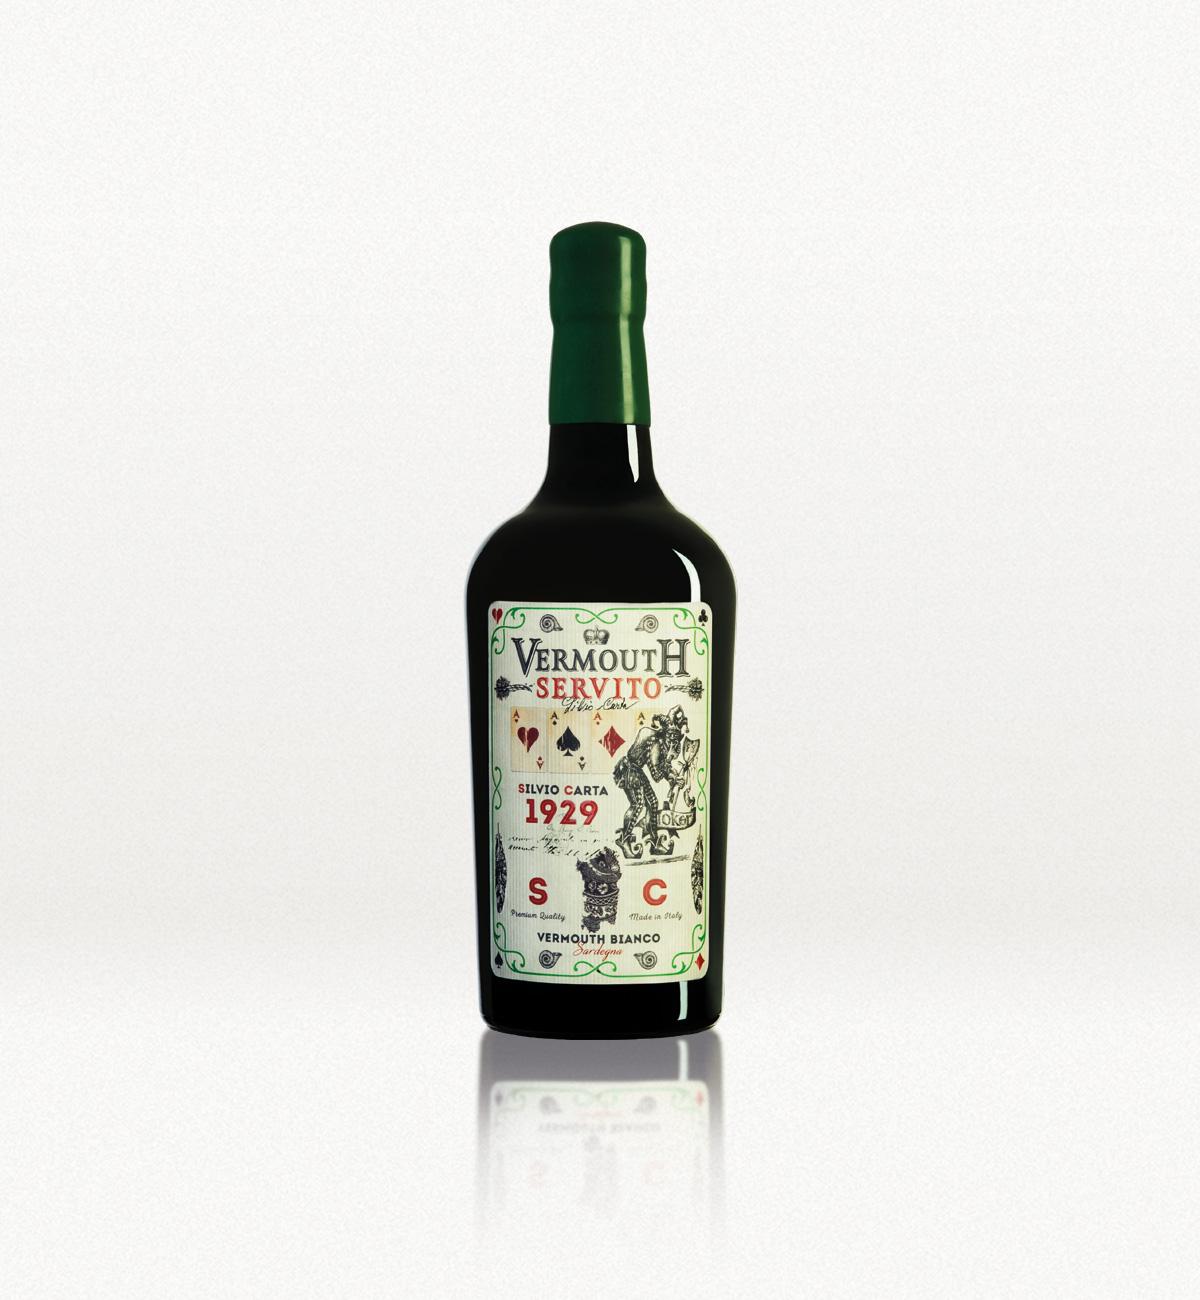 Silvio Carta Vermouth Servito